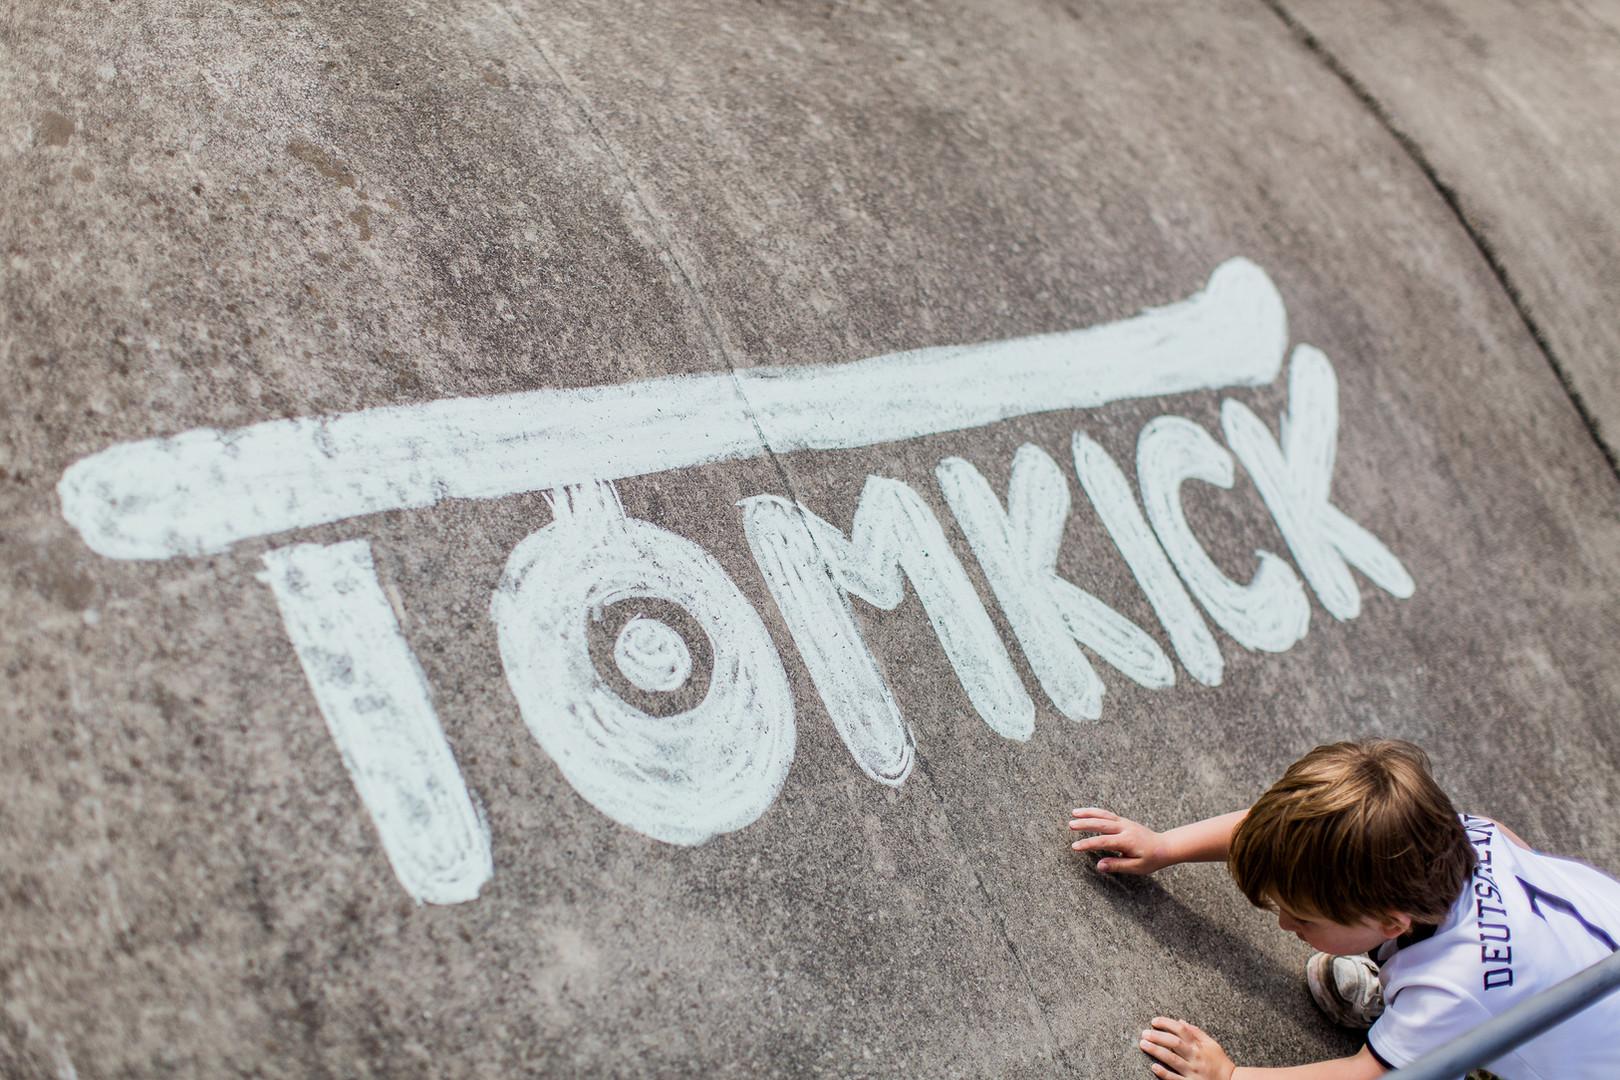 Tomkick Kreide.jpg